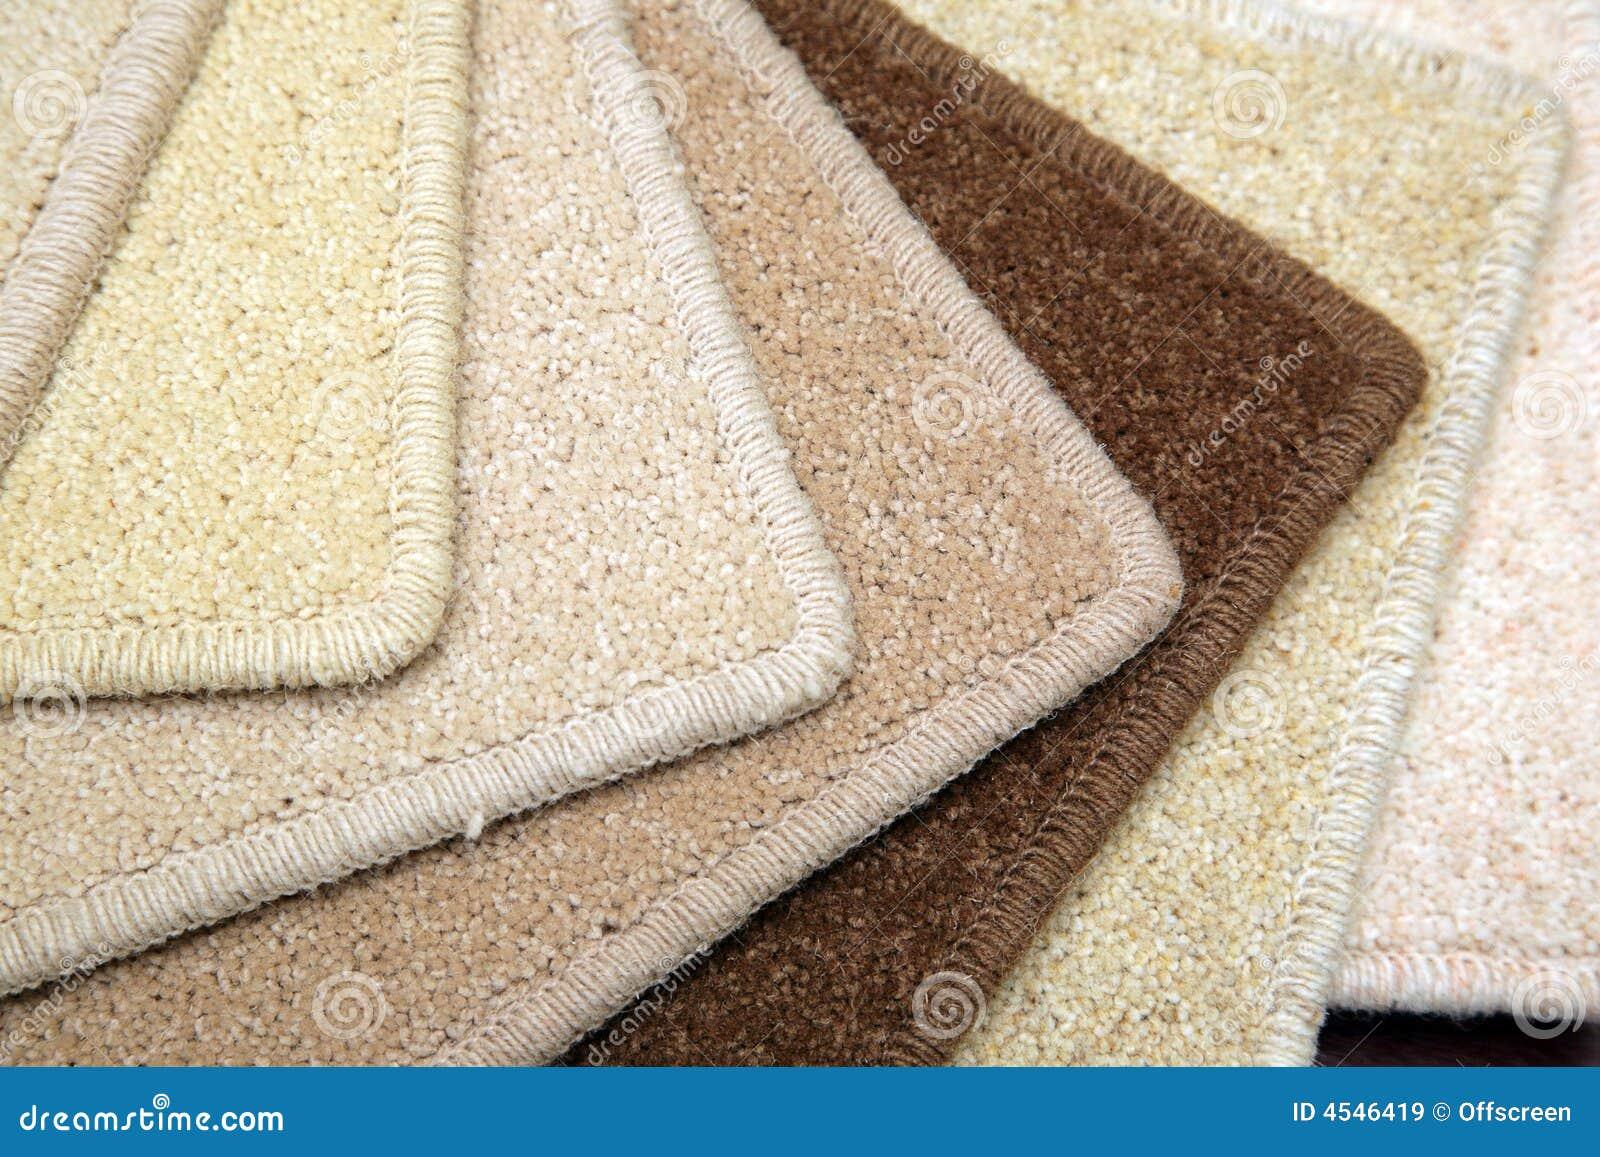 Carpet samples stock image. Image of carpet, covering